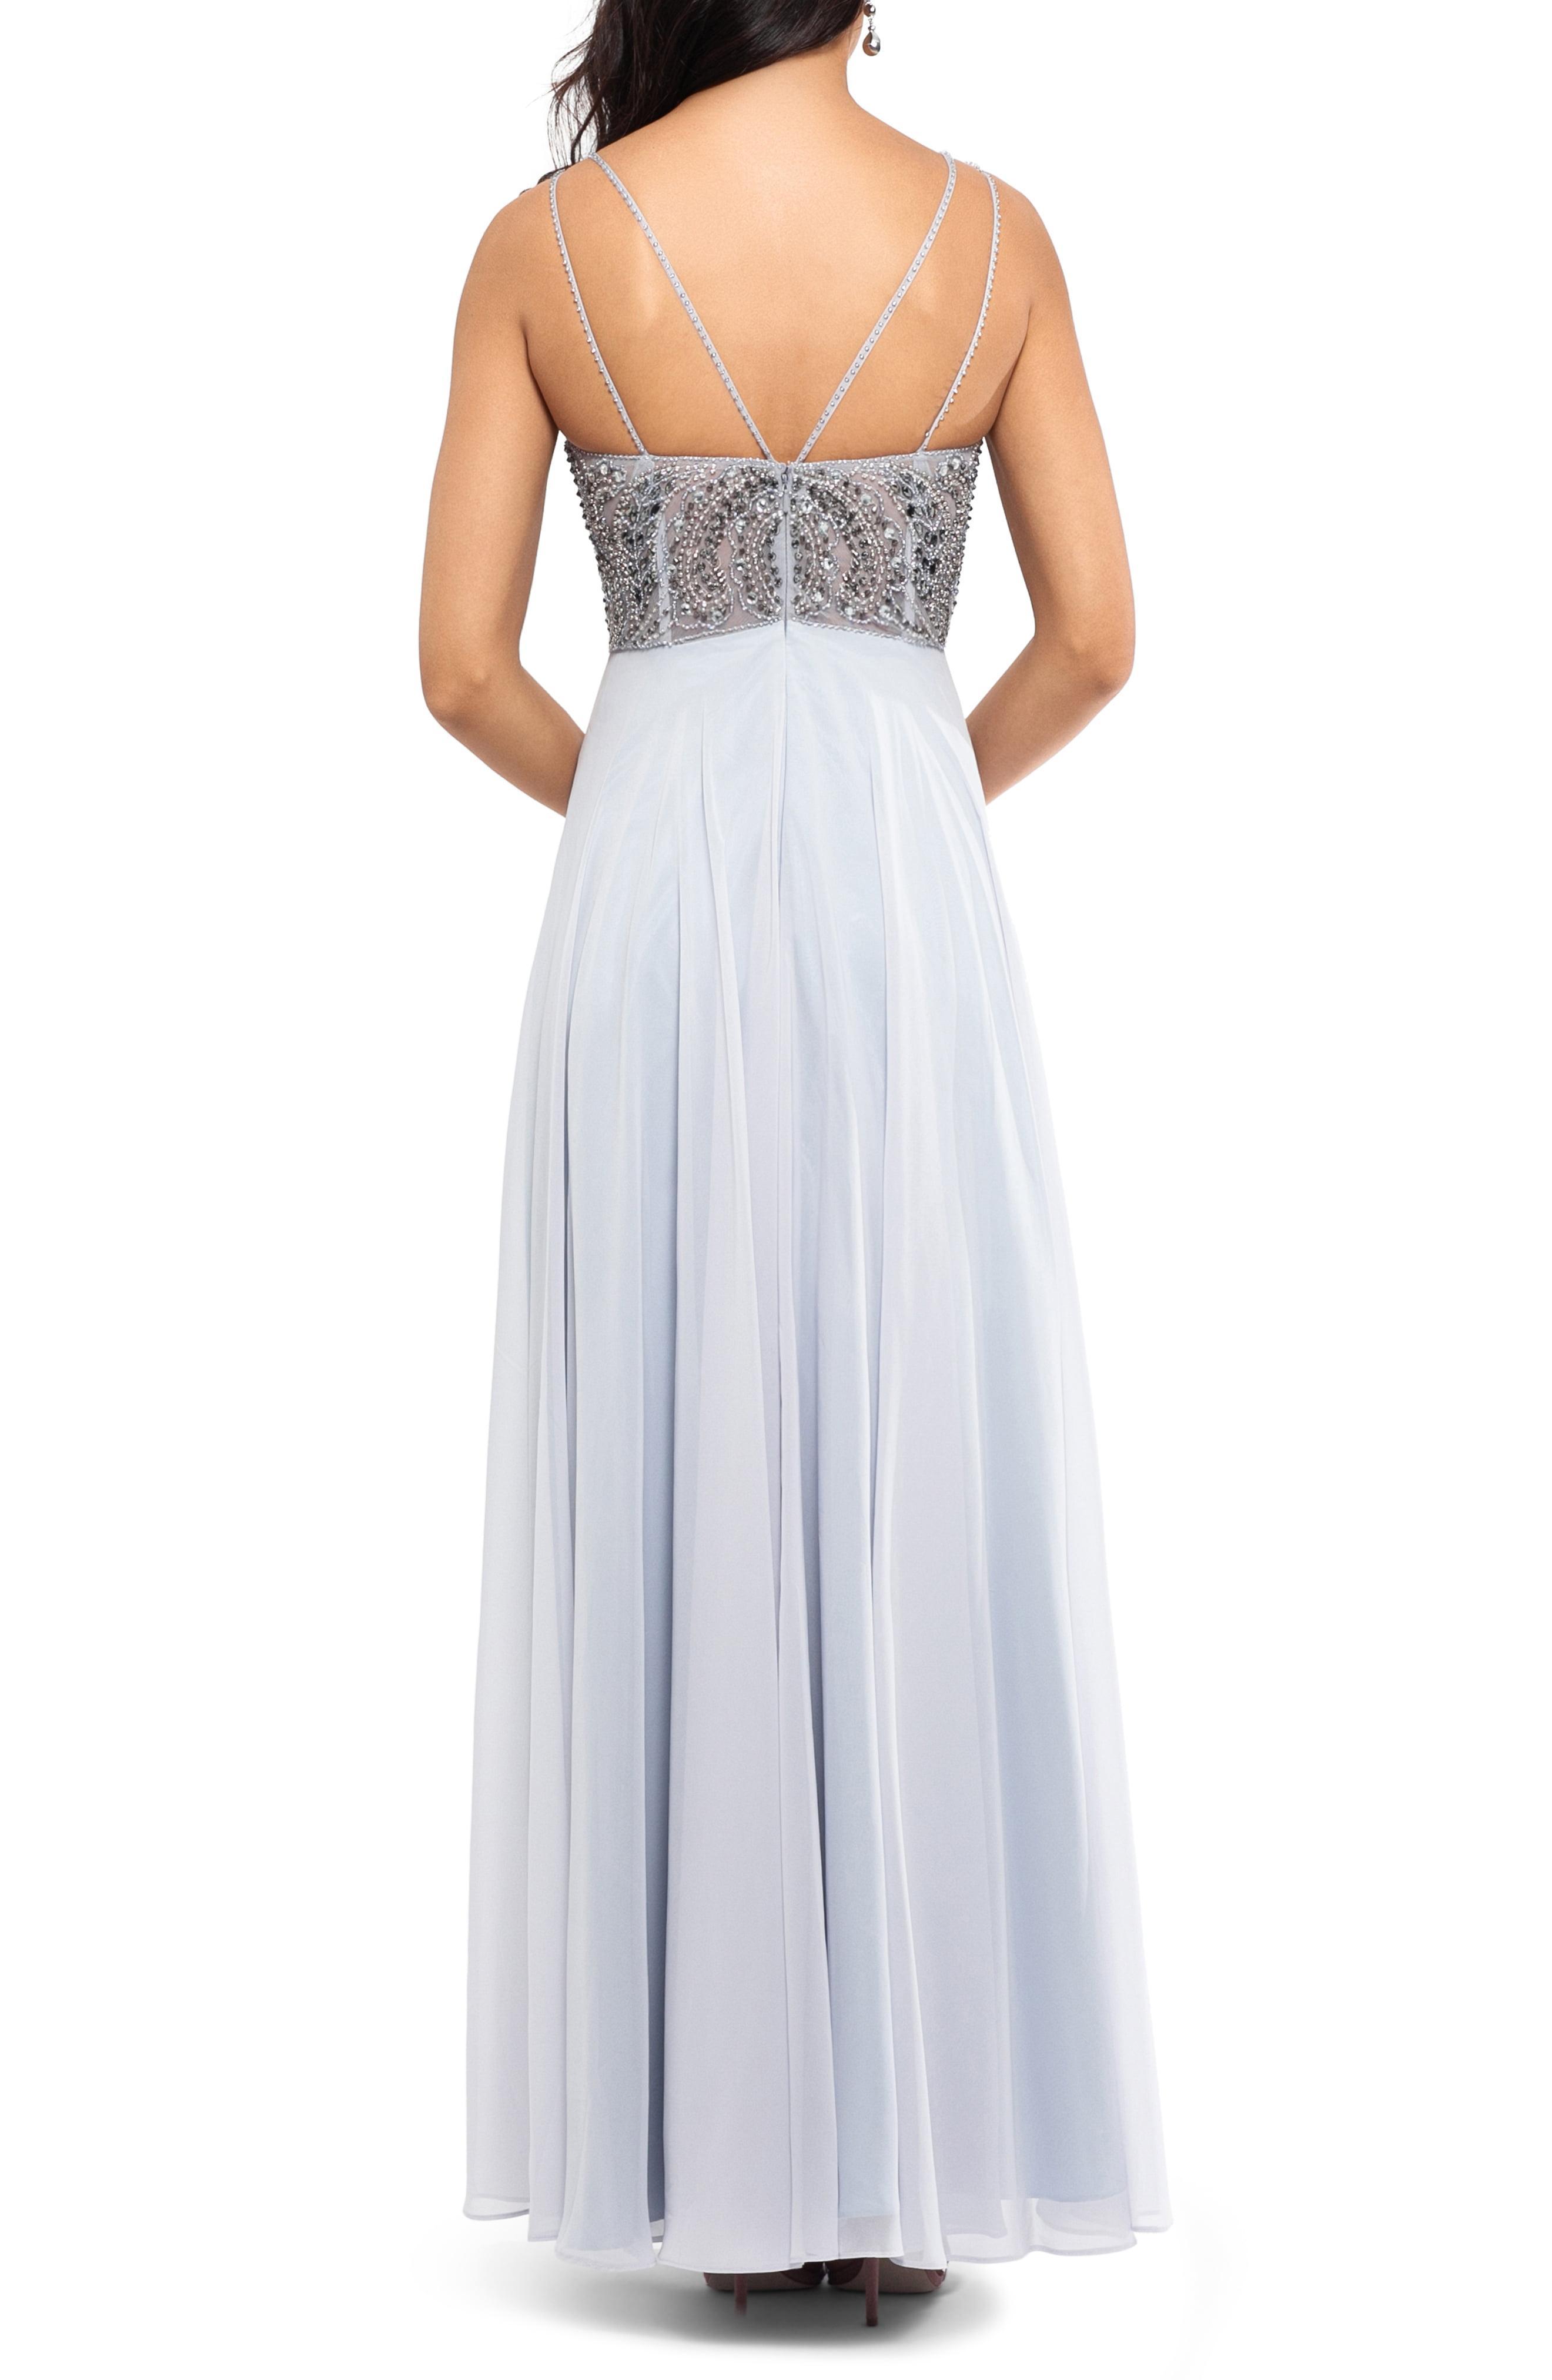 bb743fa3 Xscape - Metallic Embellished Illusion Bodice V-neck Chiffon Evening Dress  - Lyst. View fullscreen